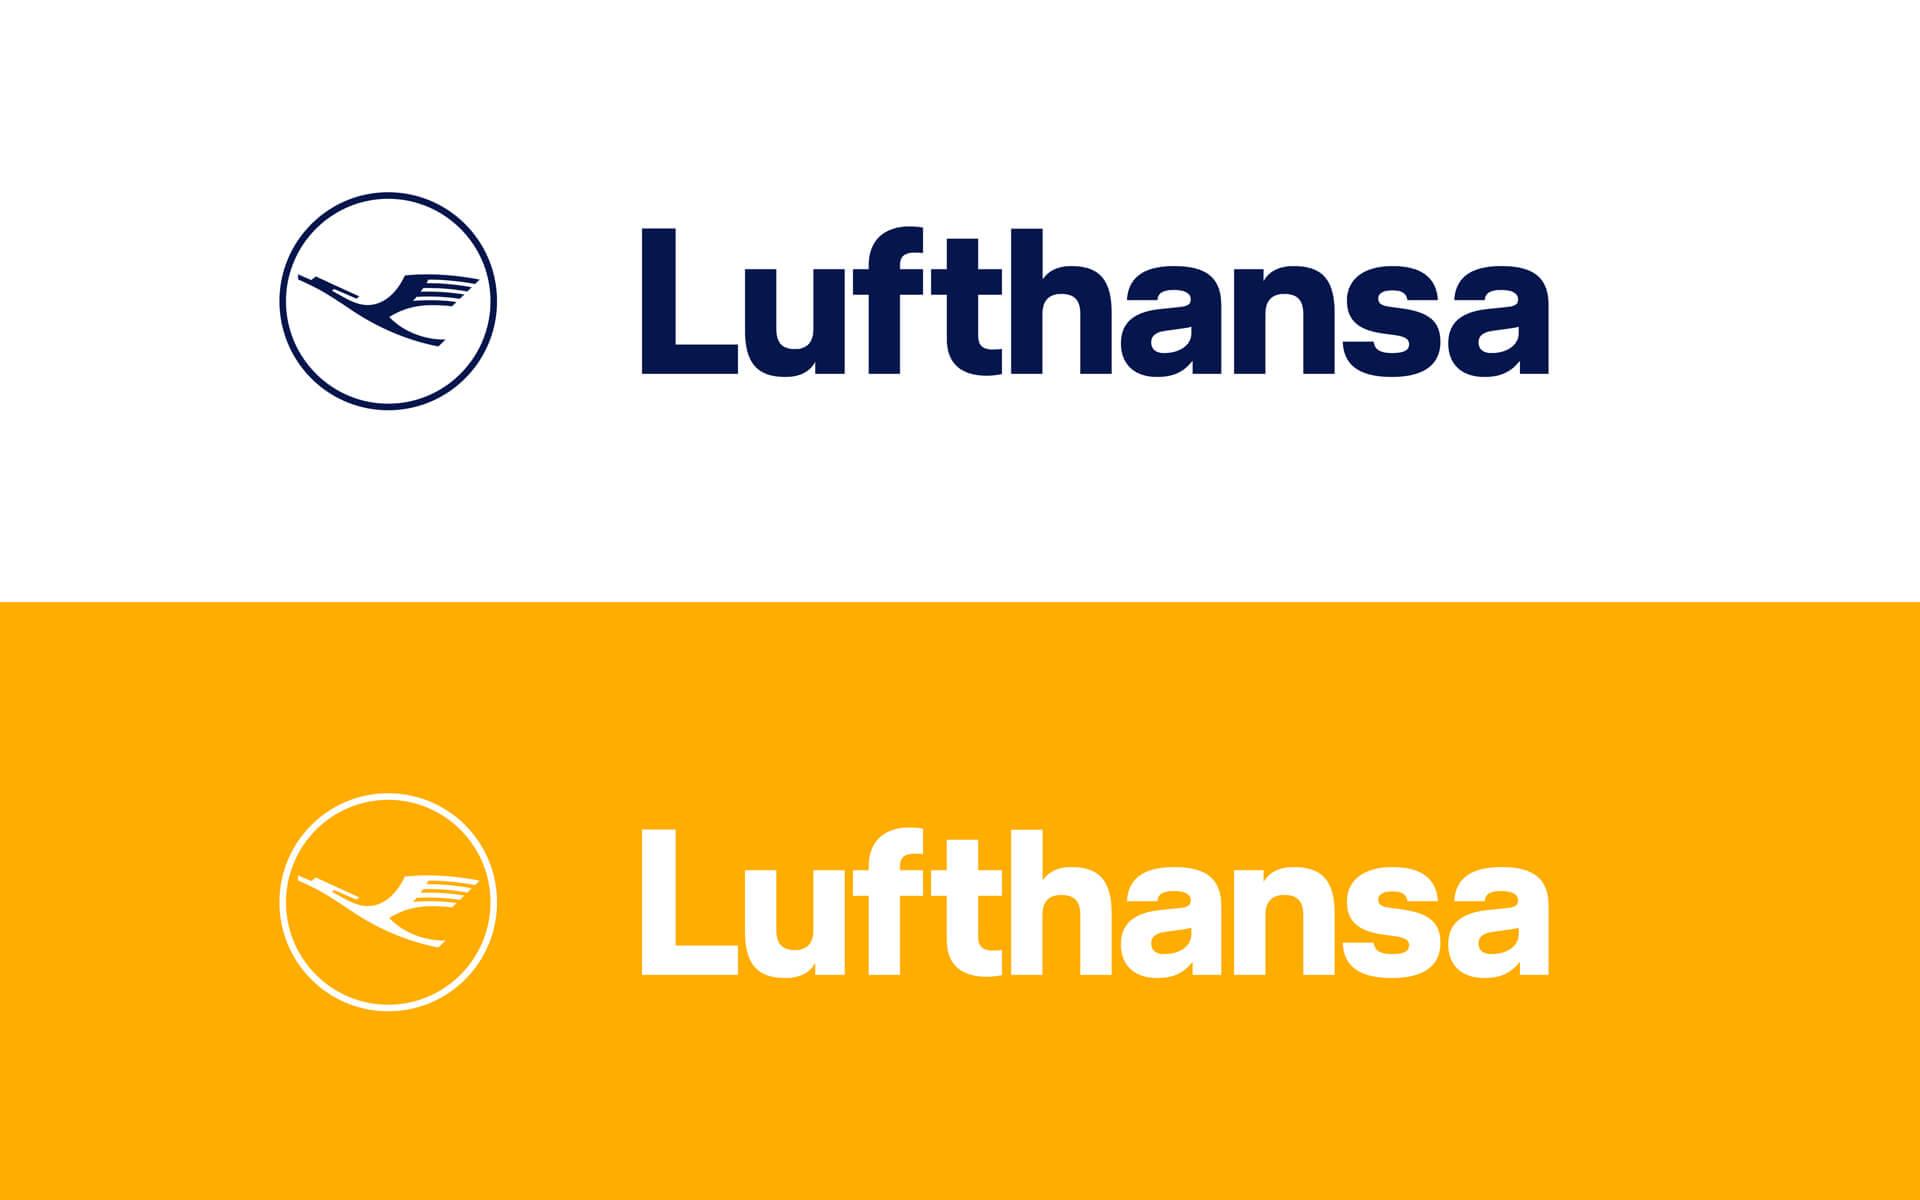 Lufthansa Corporate Design 2018, Redesign, Logotype